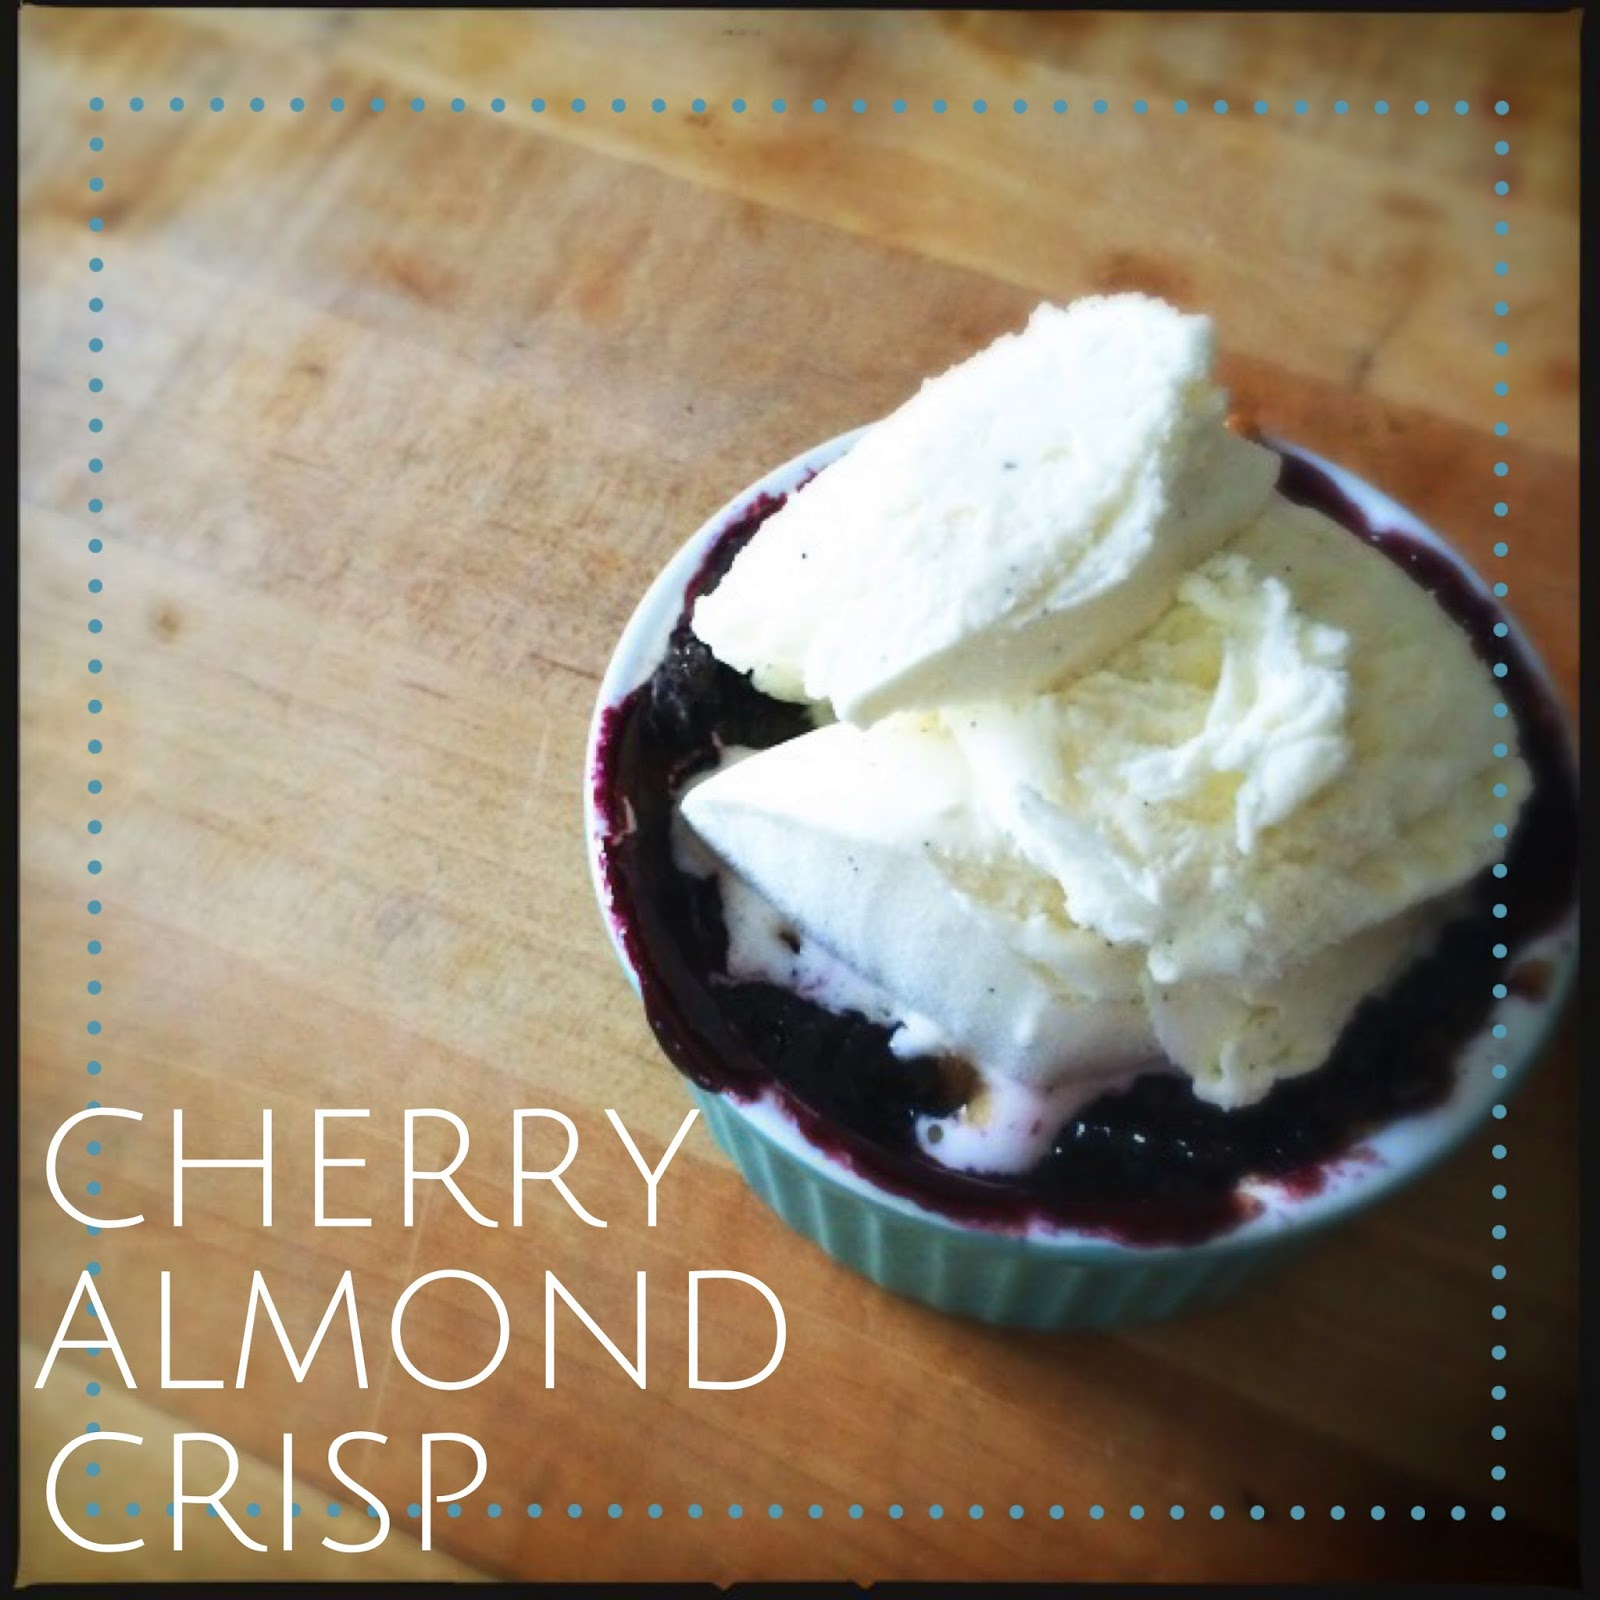 Cherry almond crisp, so good! The Graffitied Gardenia